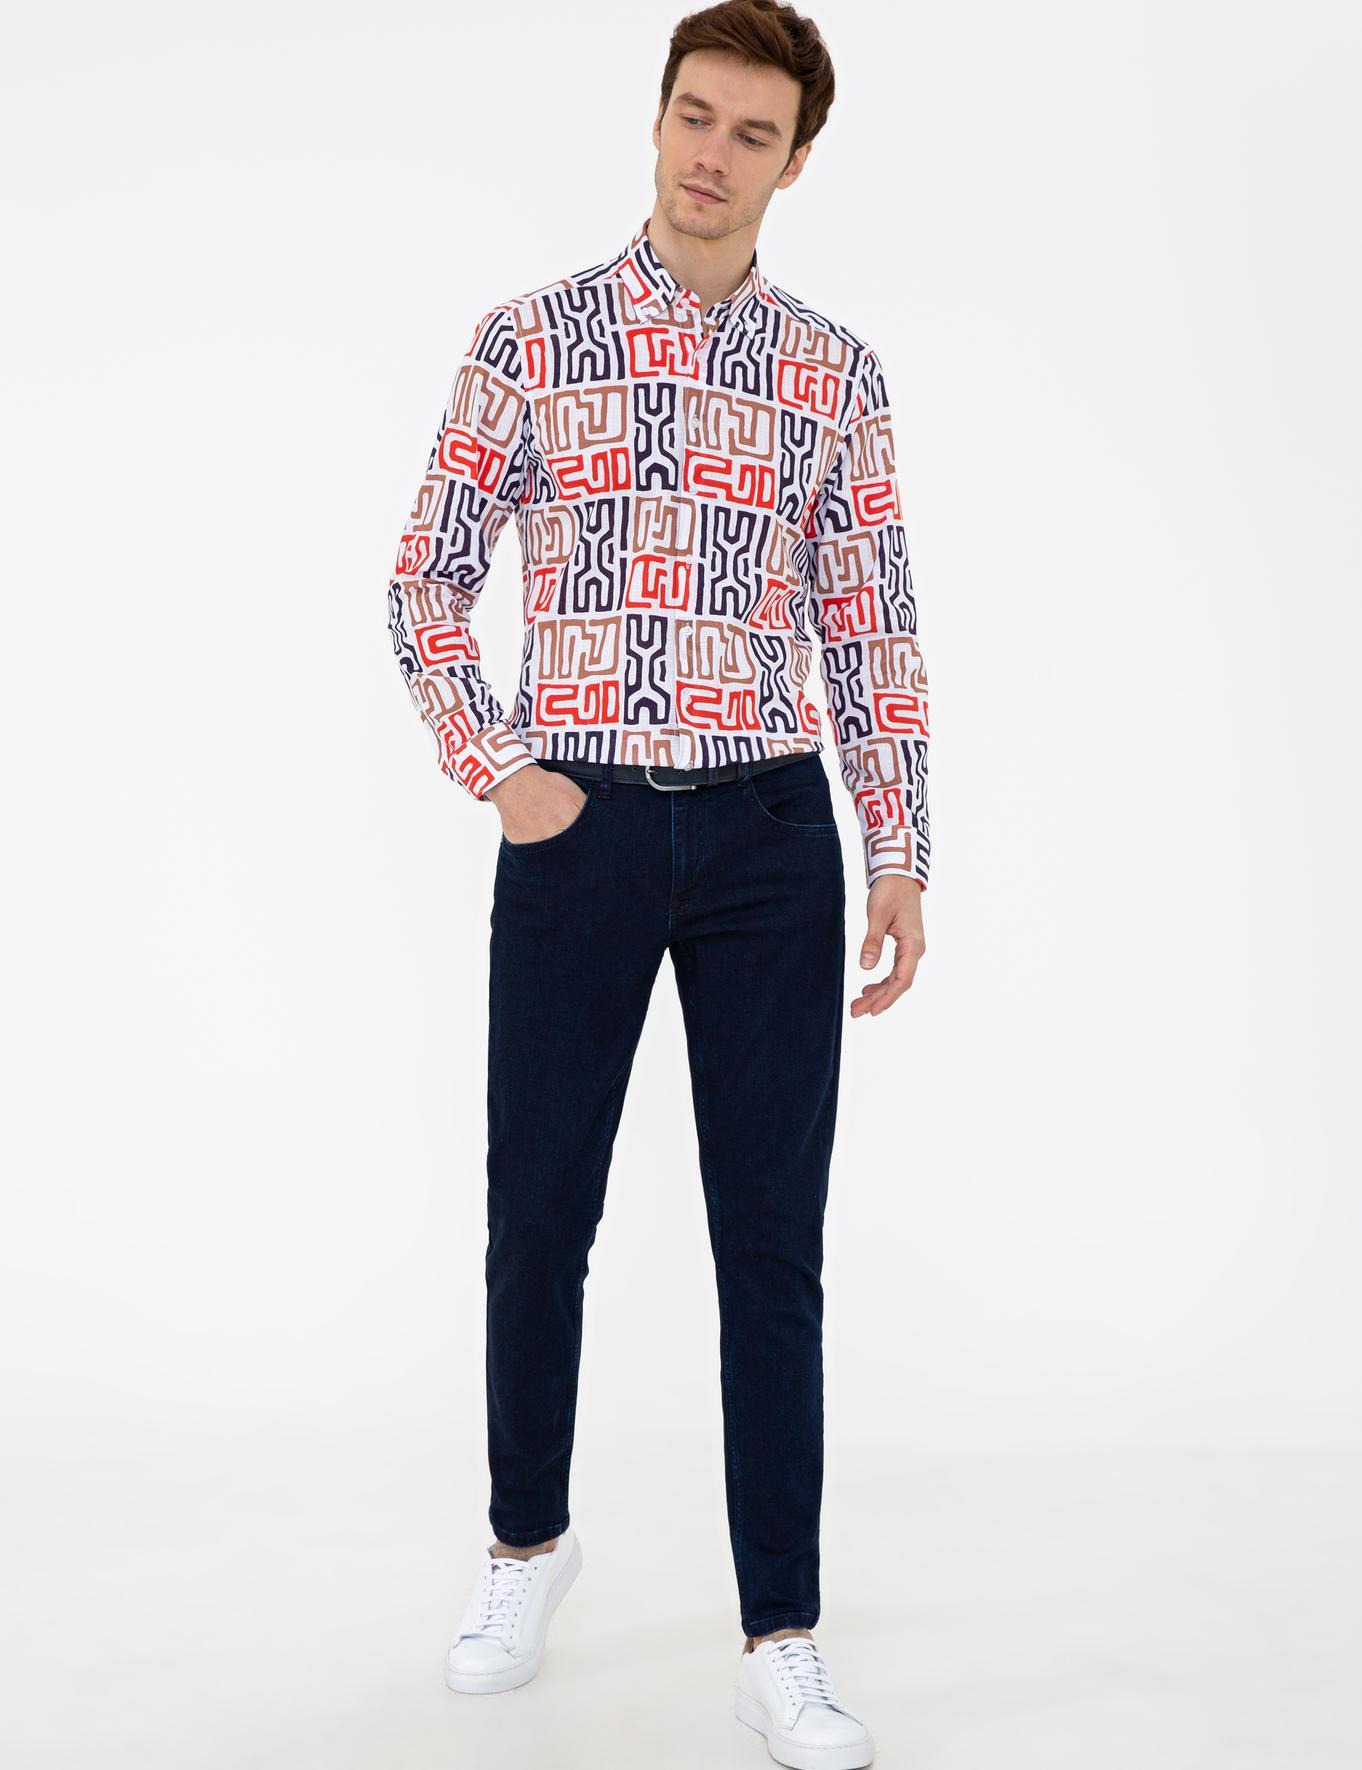 Beyaz Slim Fit Gömlek - 50233780009